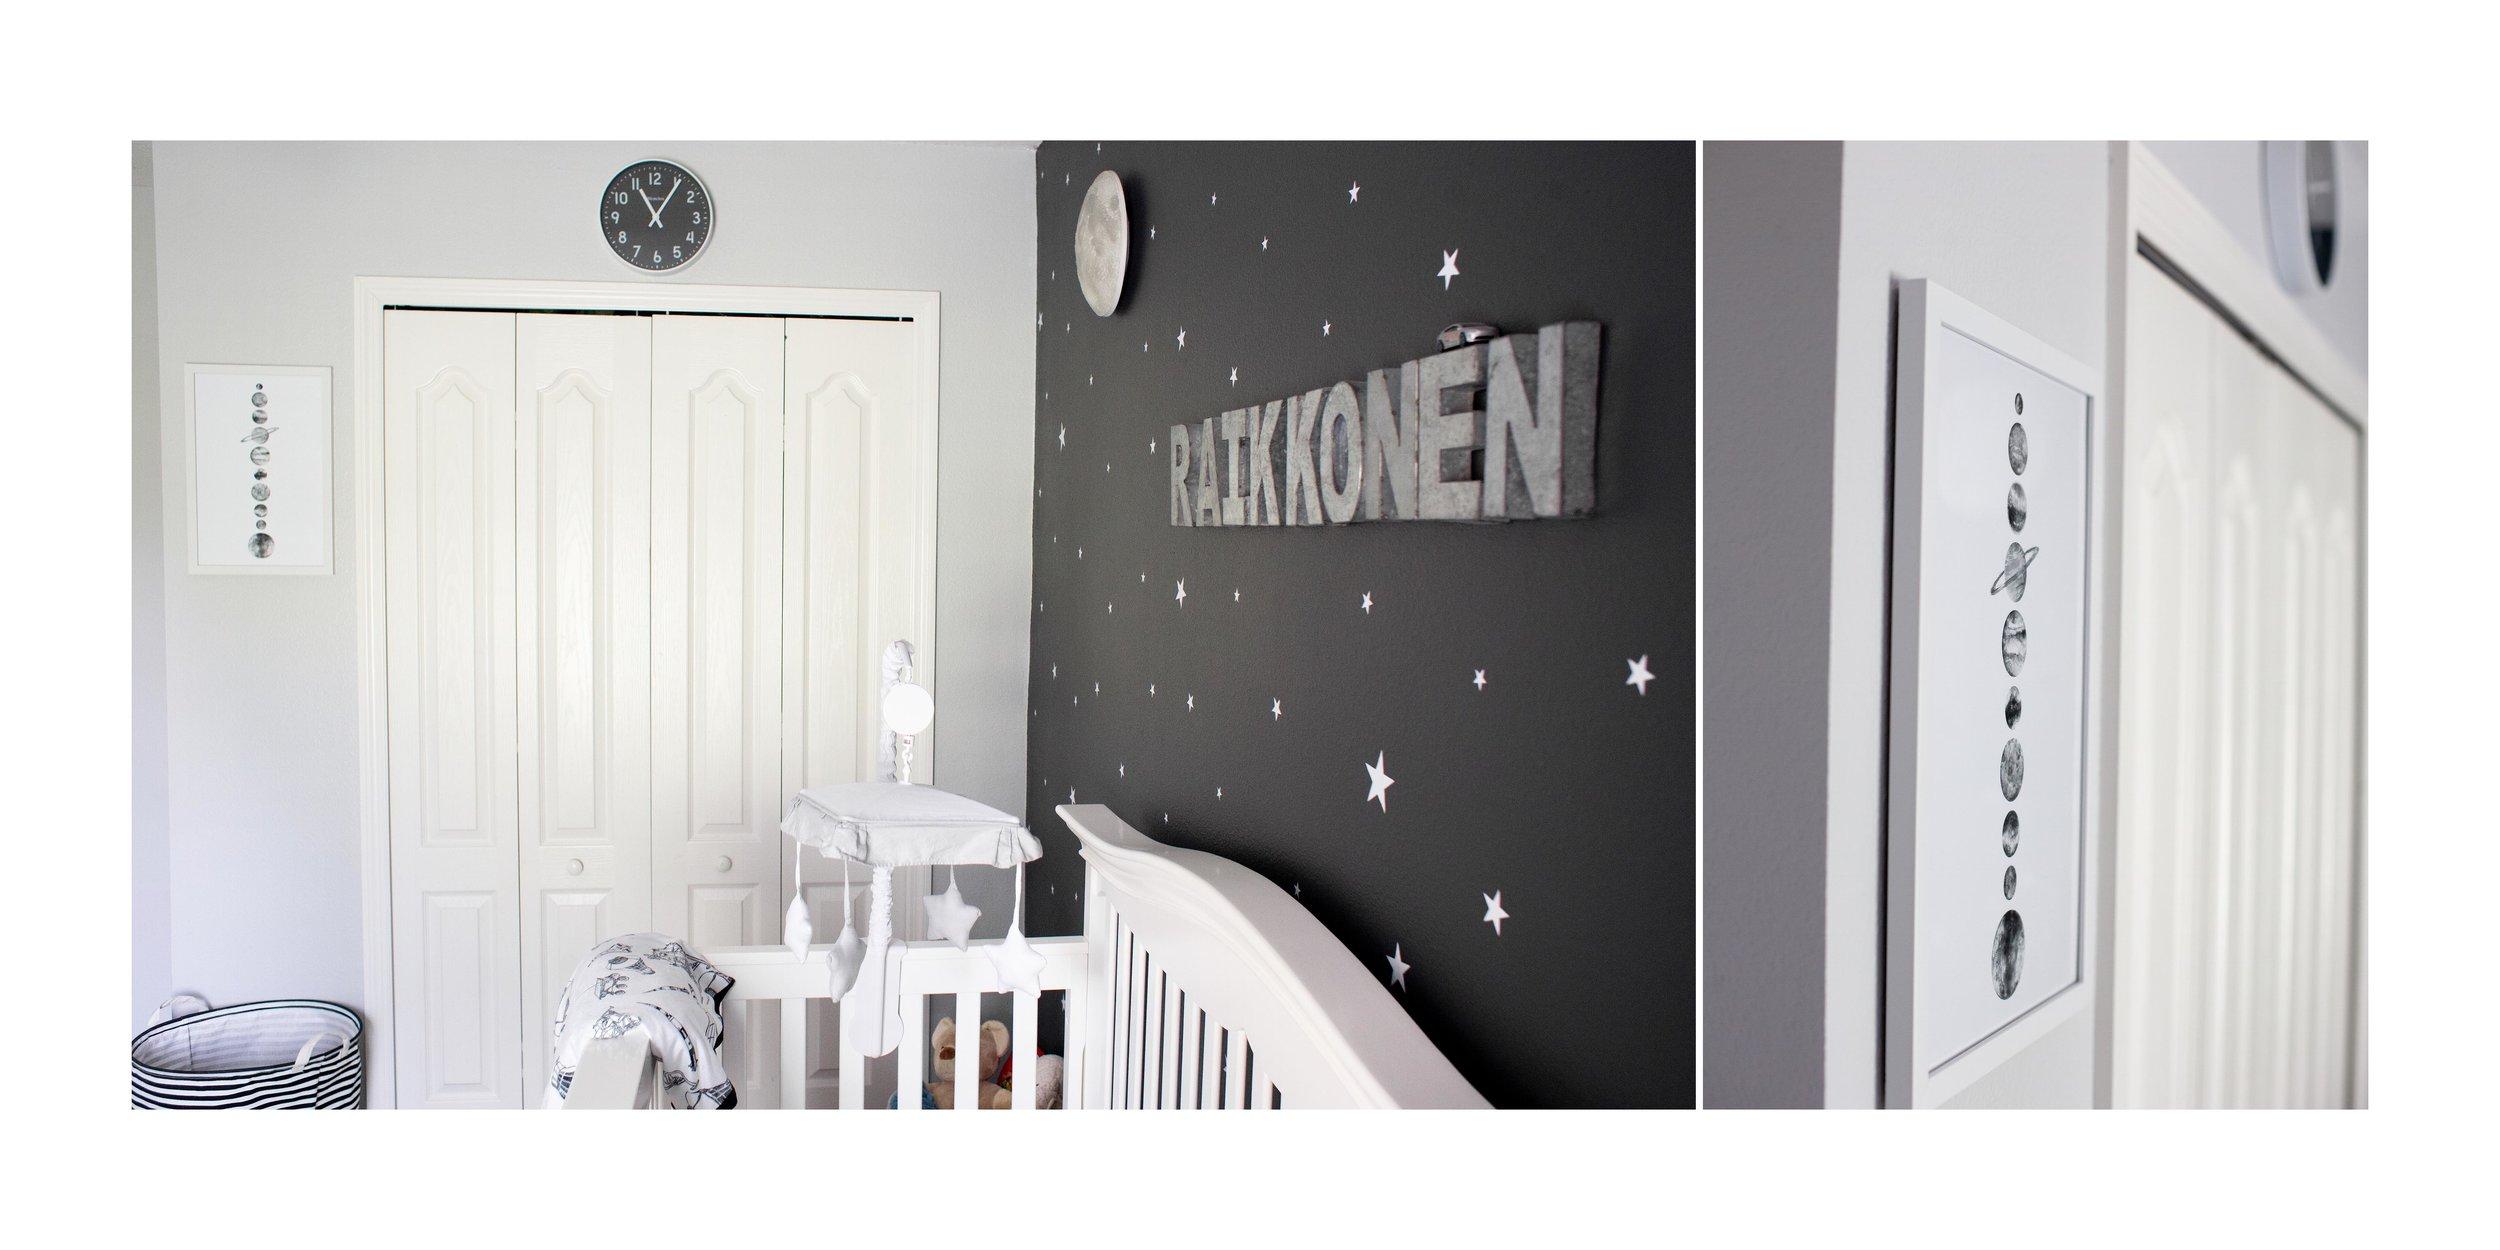 Raikkonen's_room_04.jpg